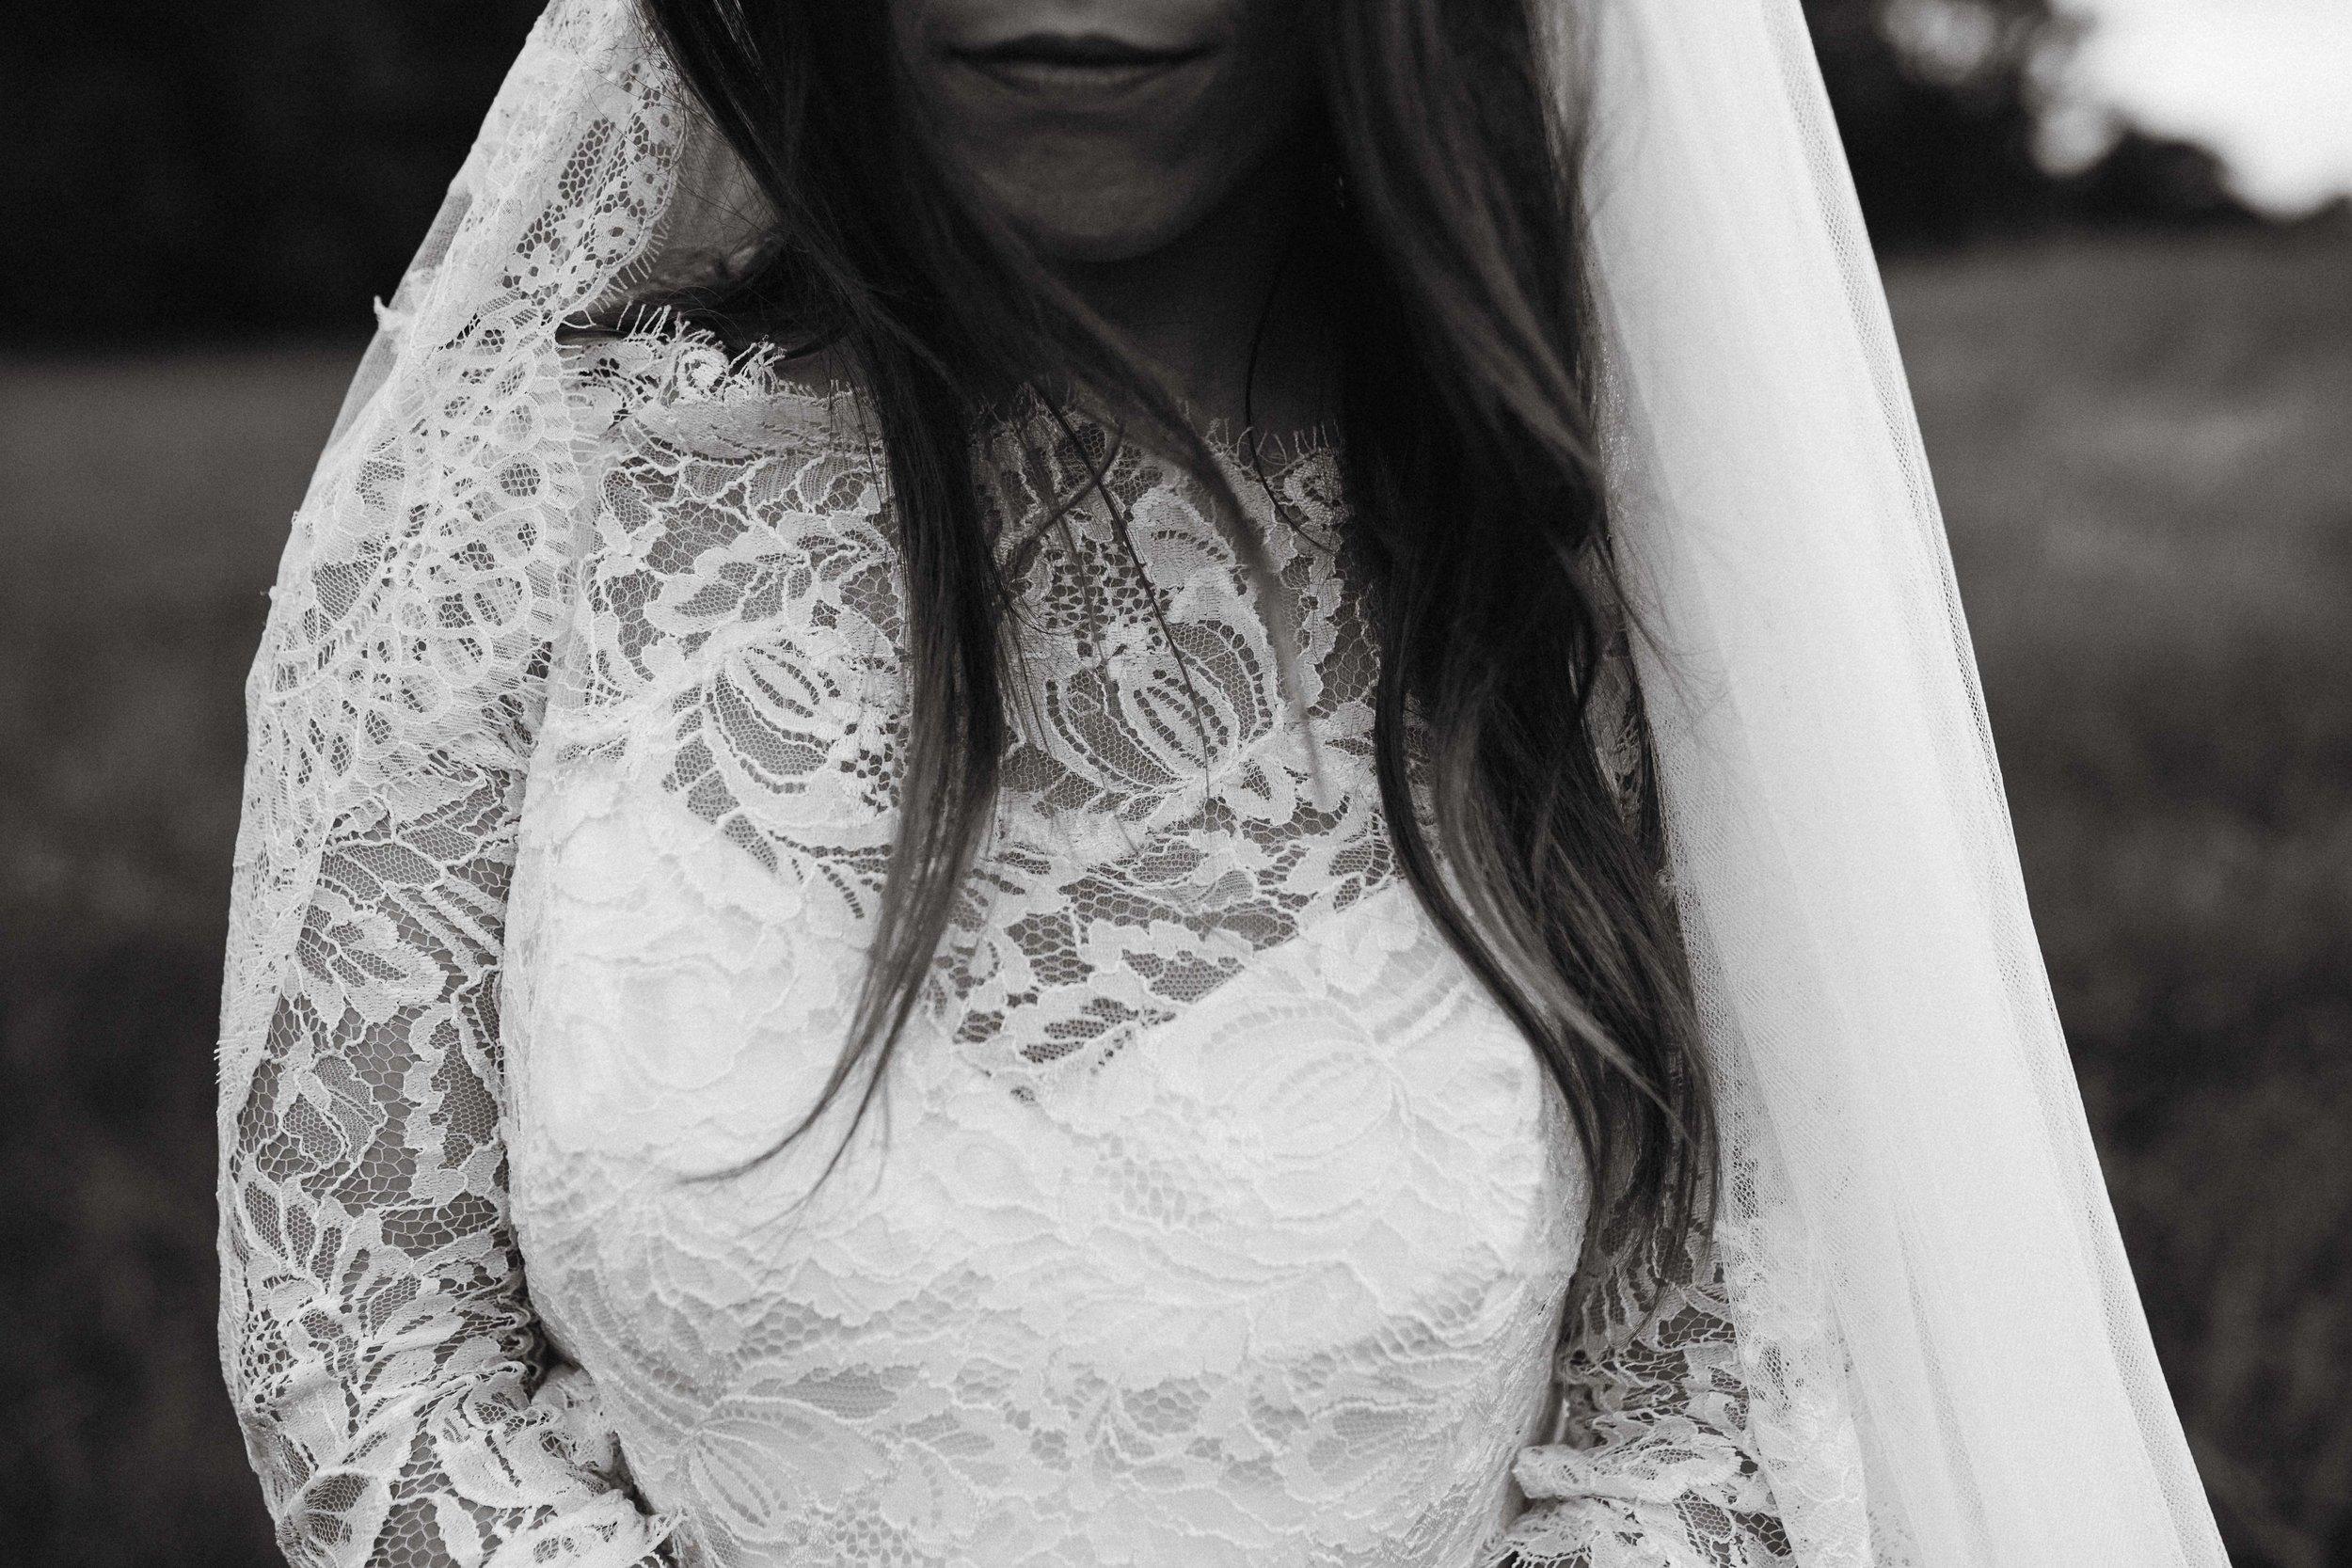 memphis tn wedding-50.jpg